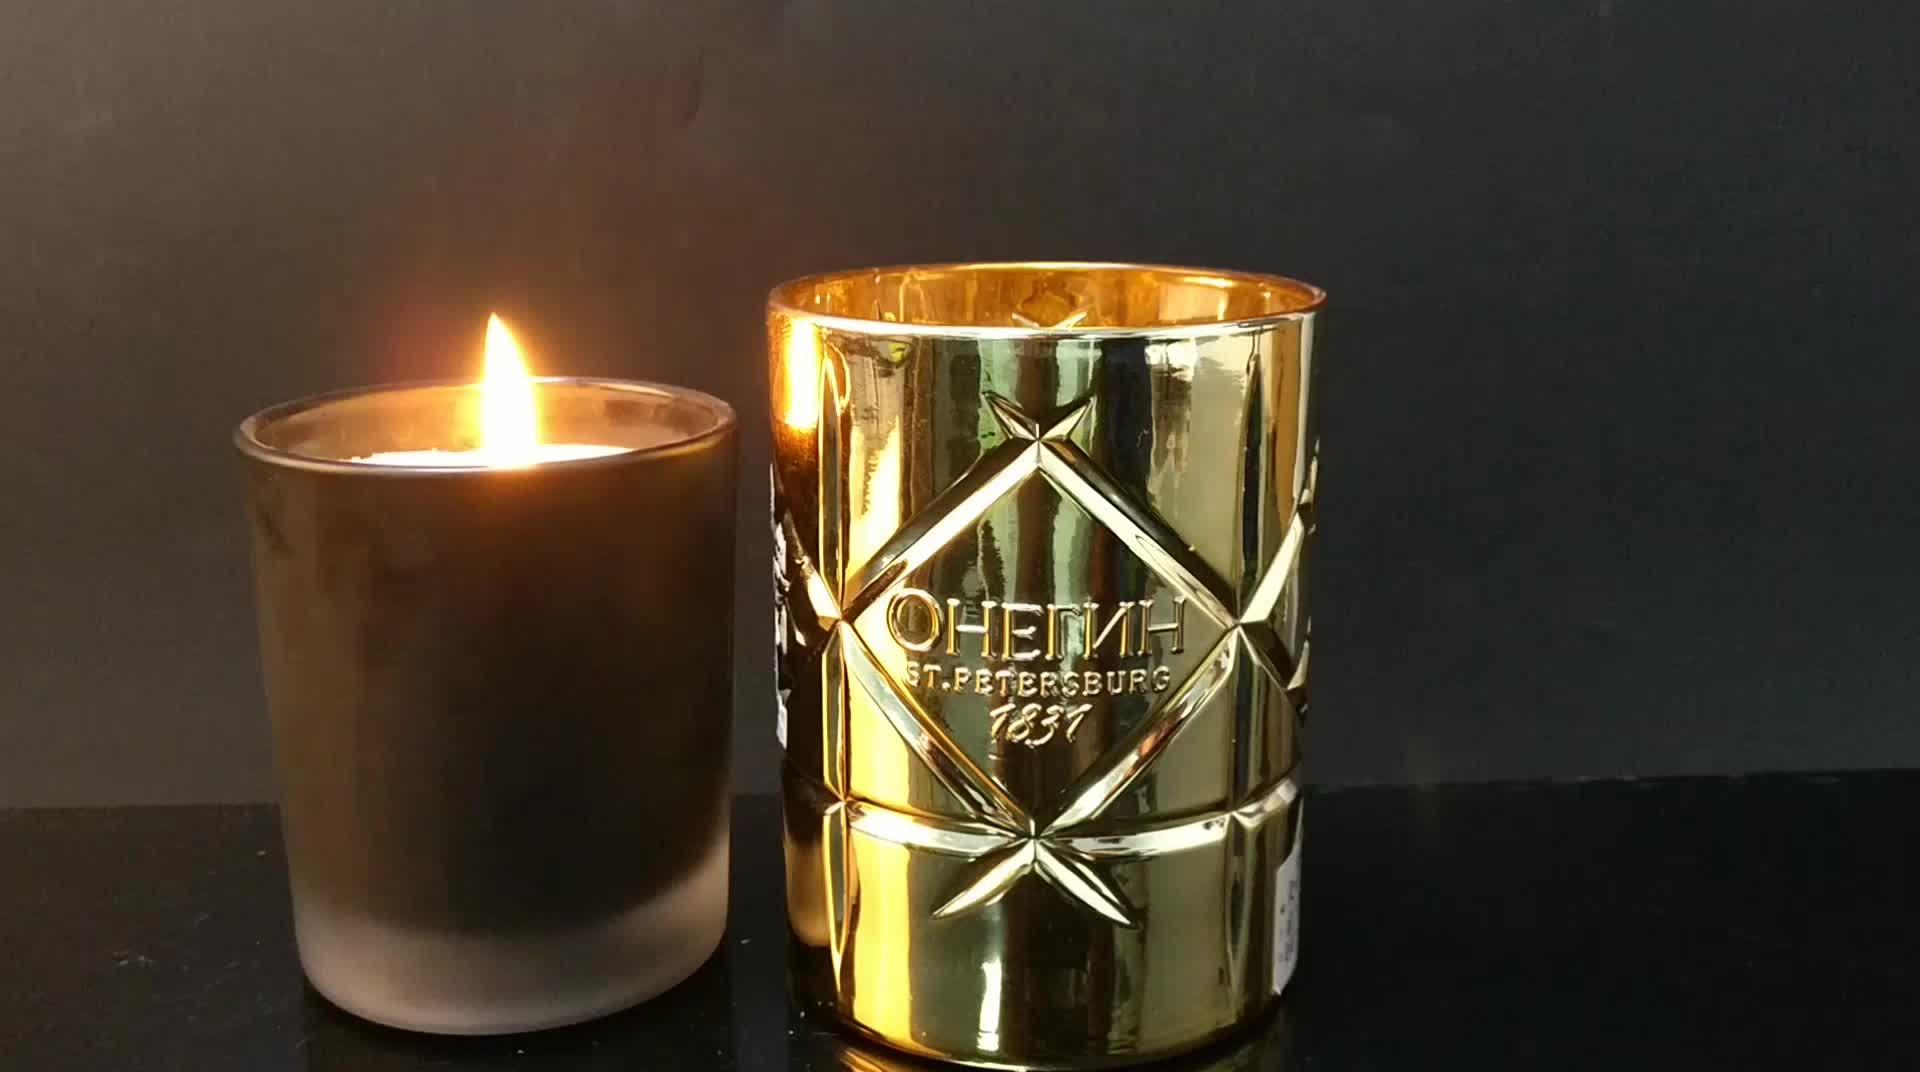 China Wholesale White cheap tealight candle holder Wedding Decor, glass tealight holder